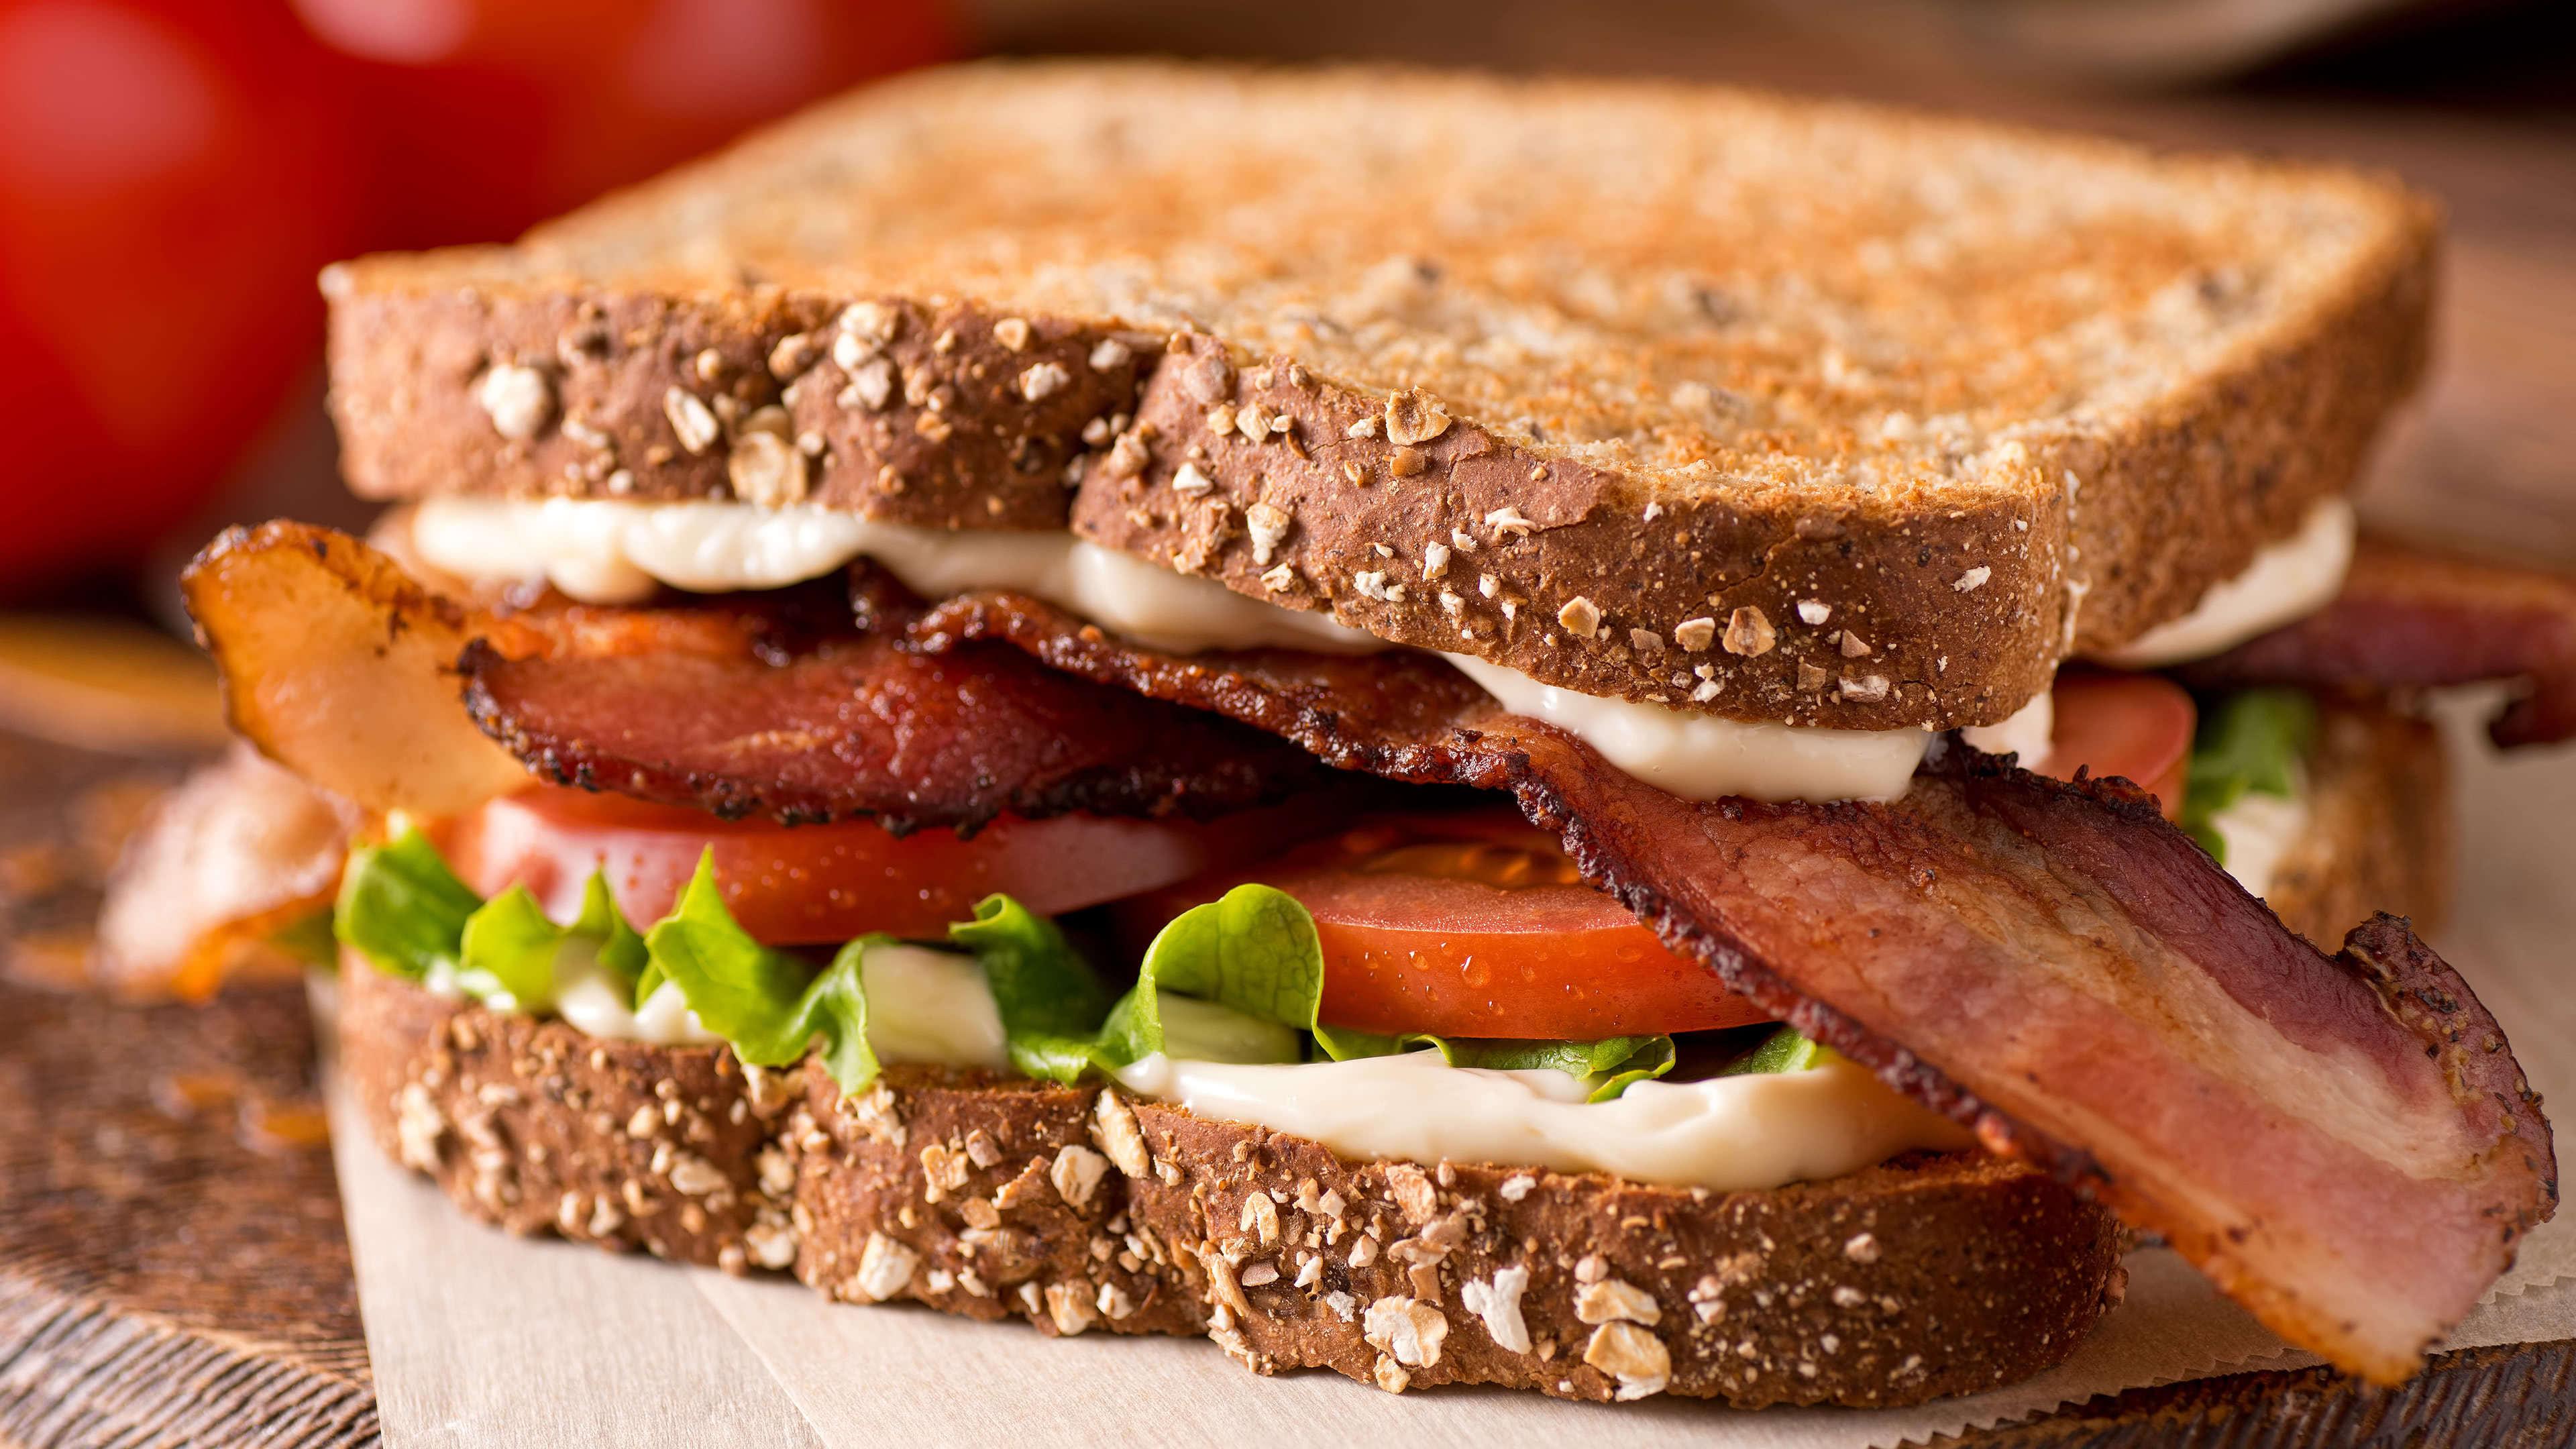 classic blt bacon lettuce tomato sandwich uhd 4k wallpaper